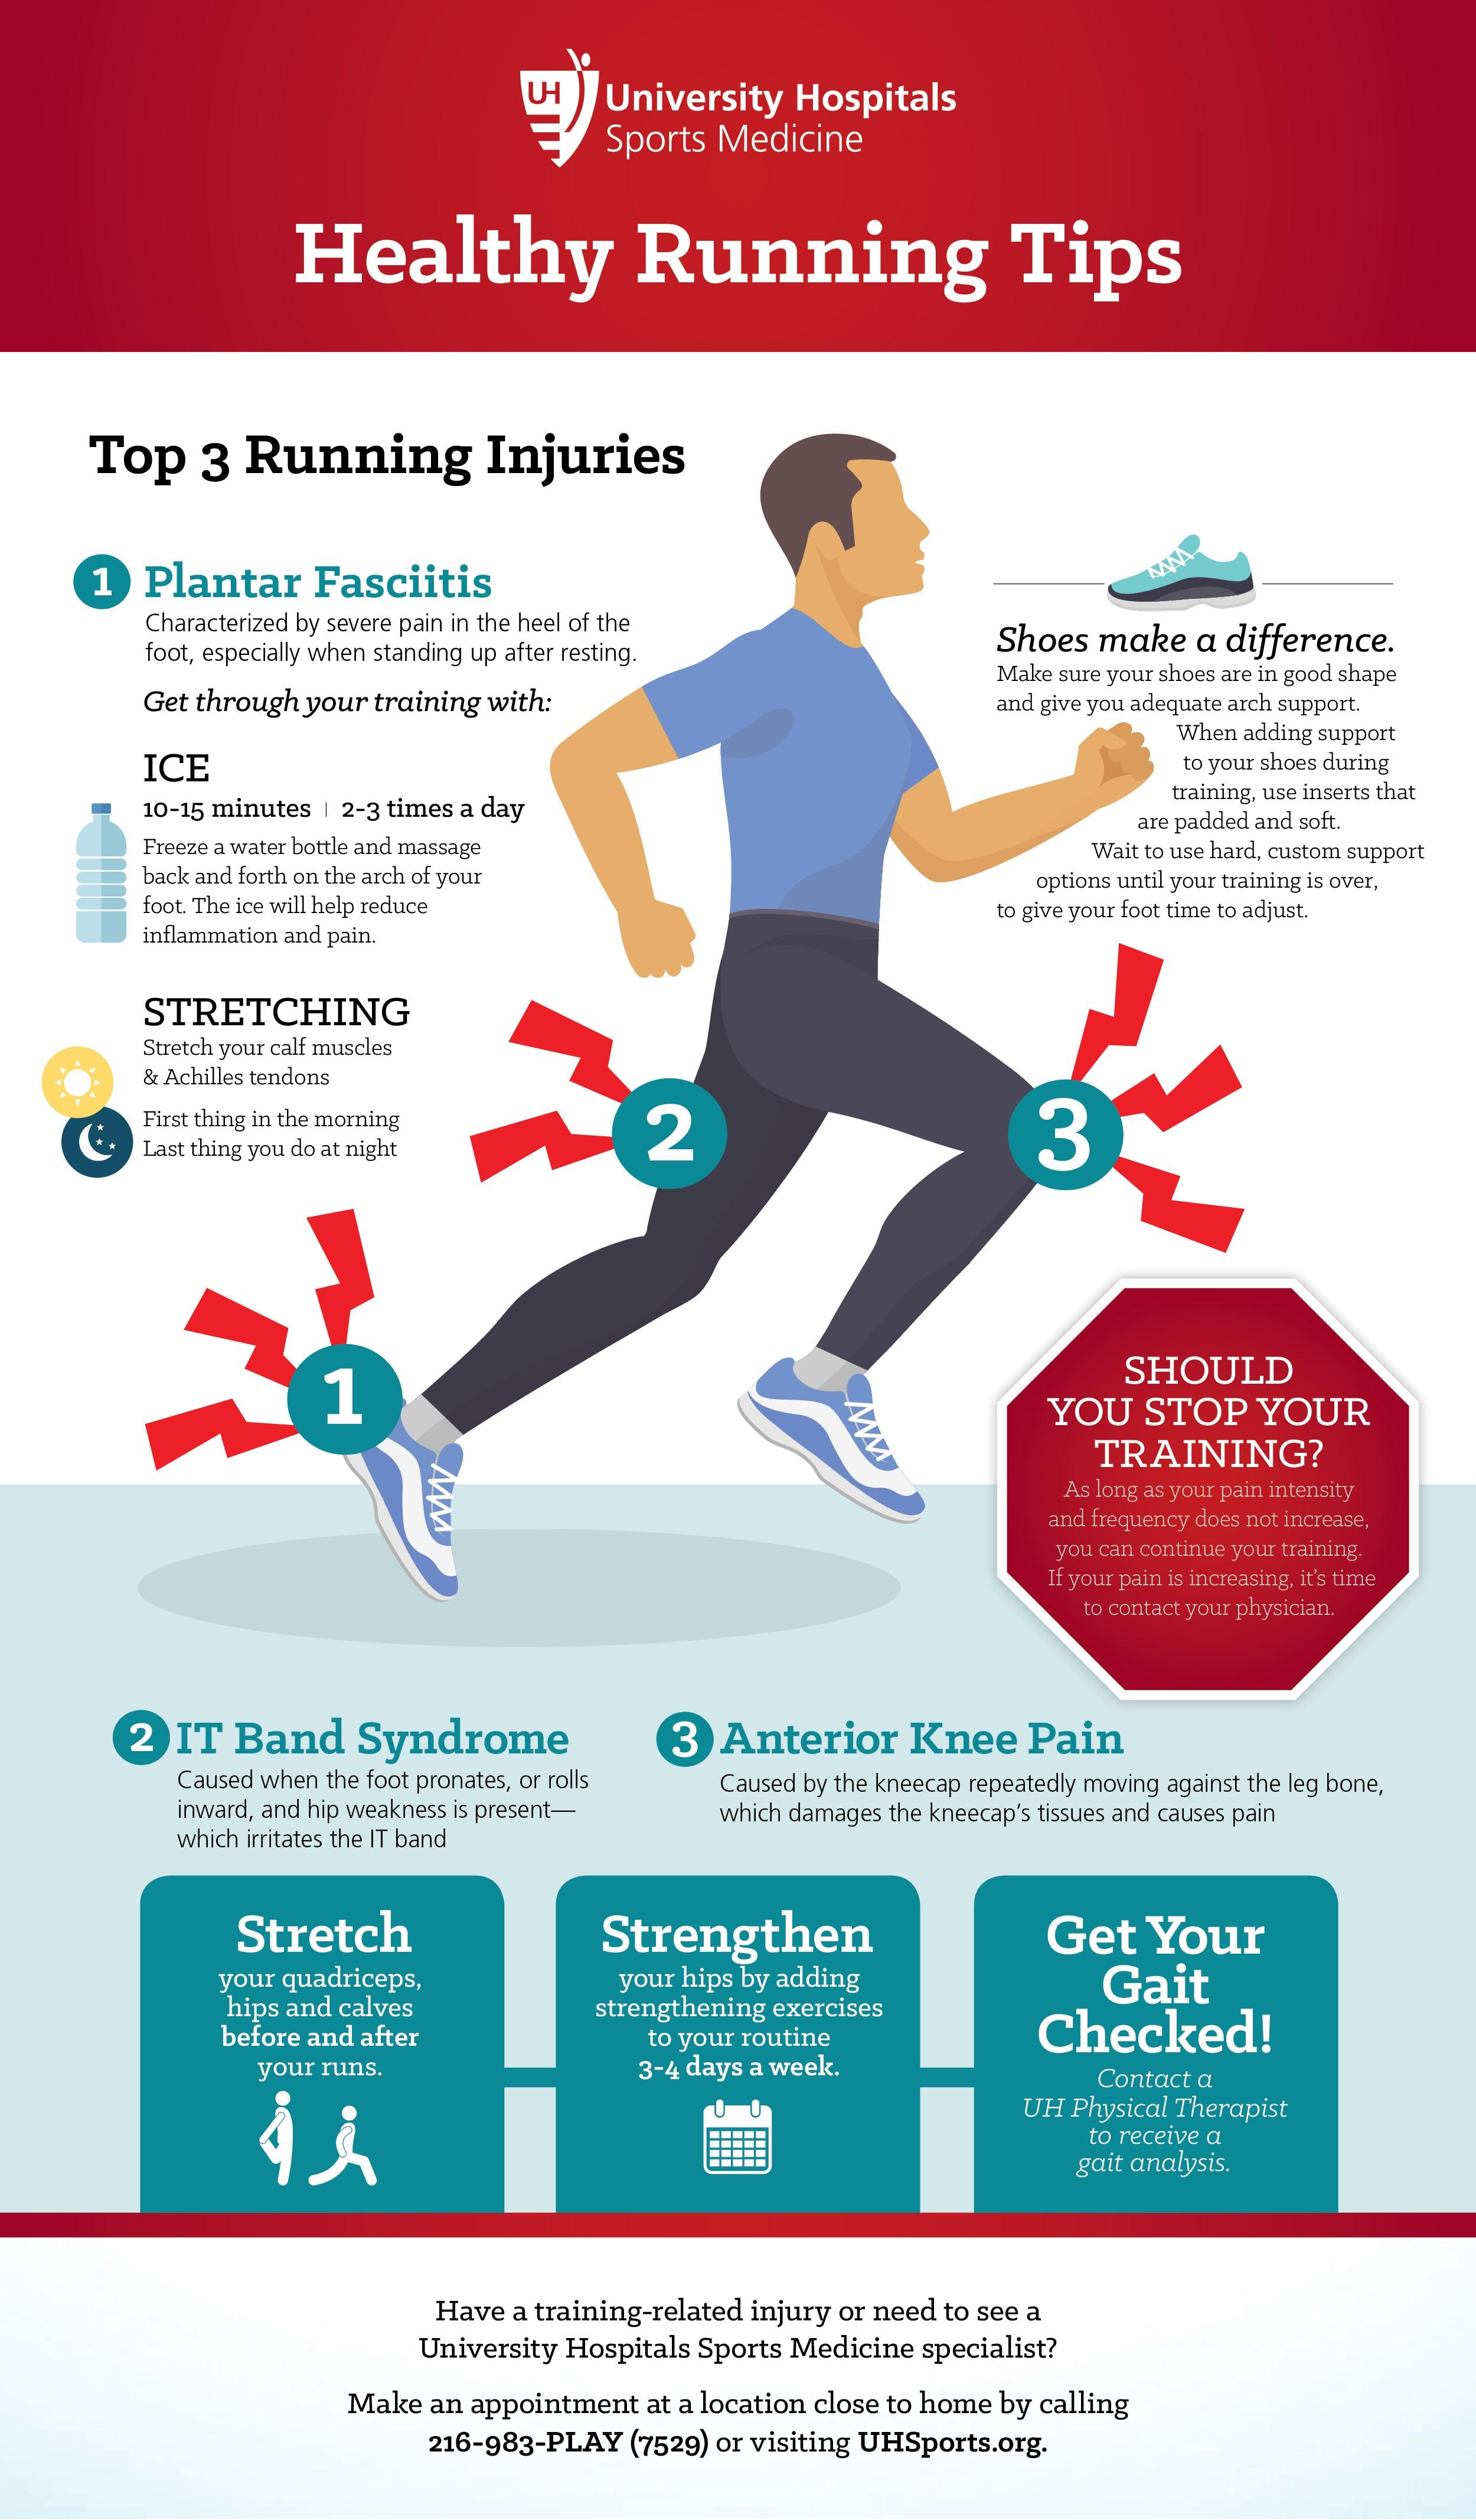 UH_Top3RunningInjuries_Infographic_Triathlon.jpg